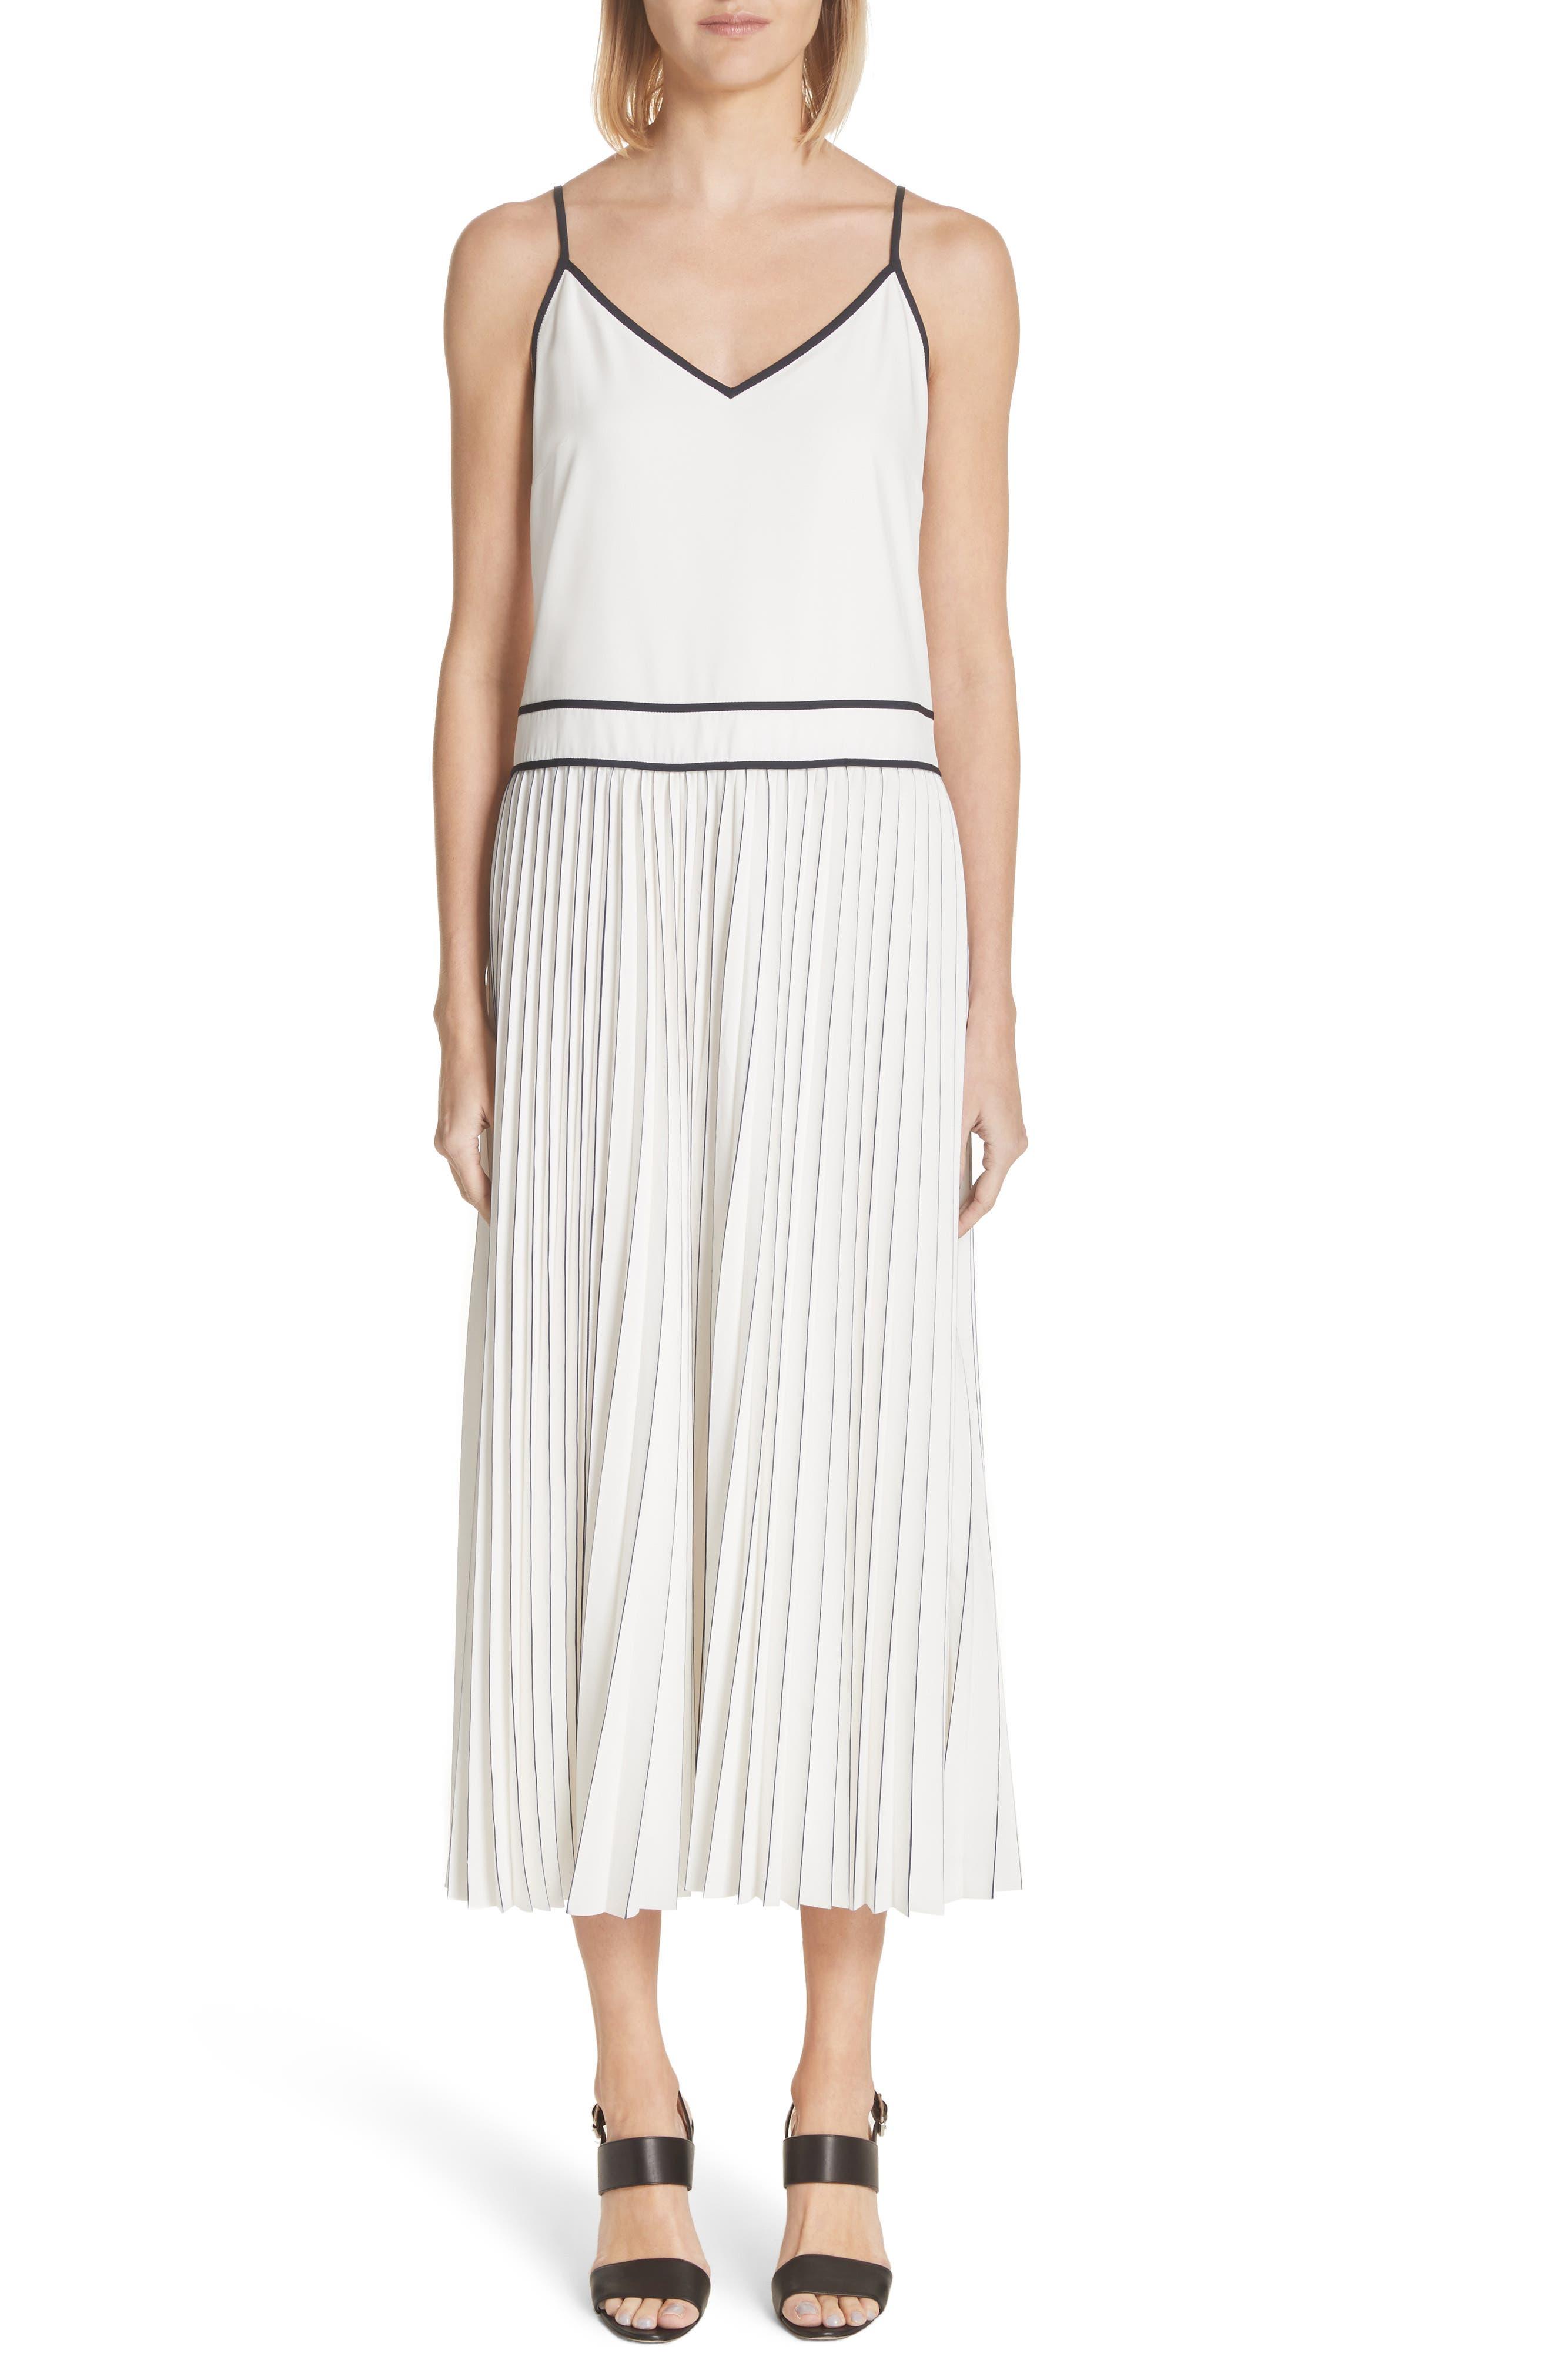 Silk Pleated Skirt Midi Dress,                             Main thumbnail 1, color,                             129